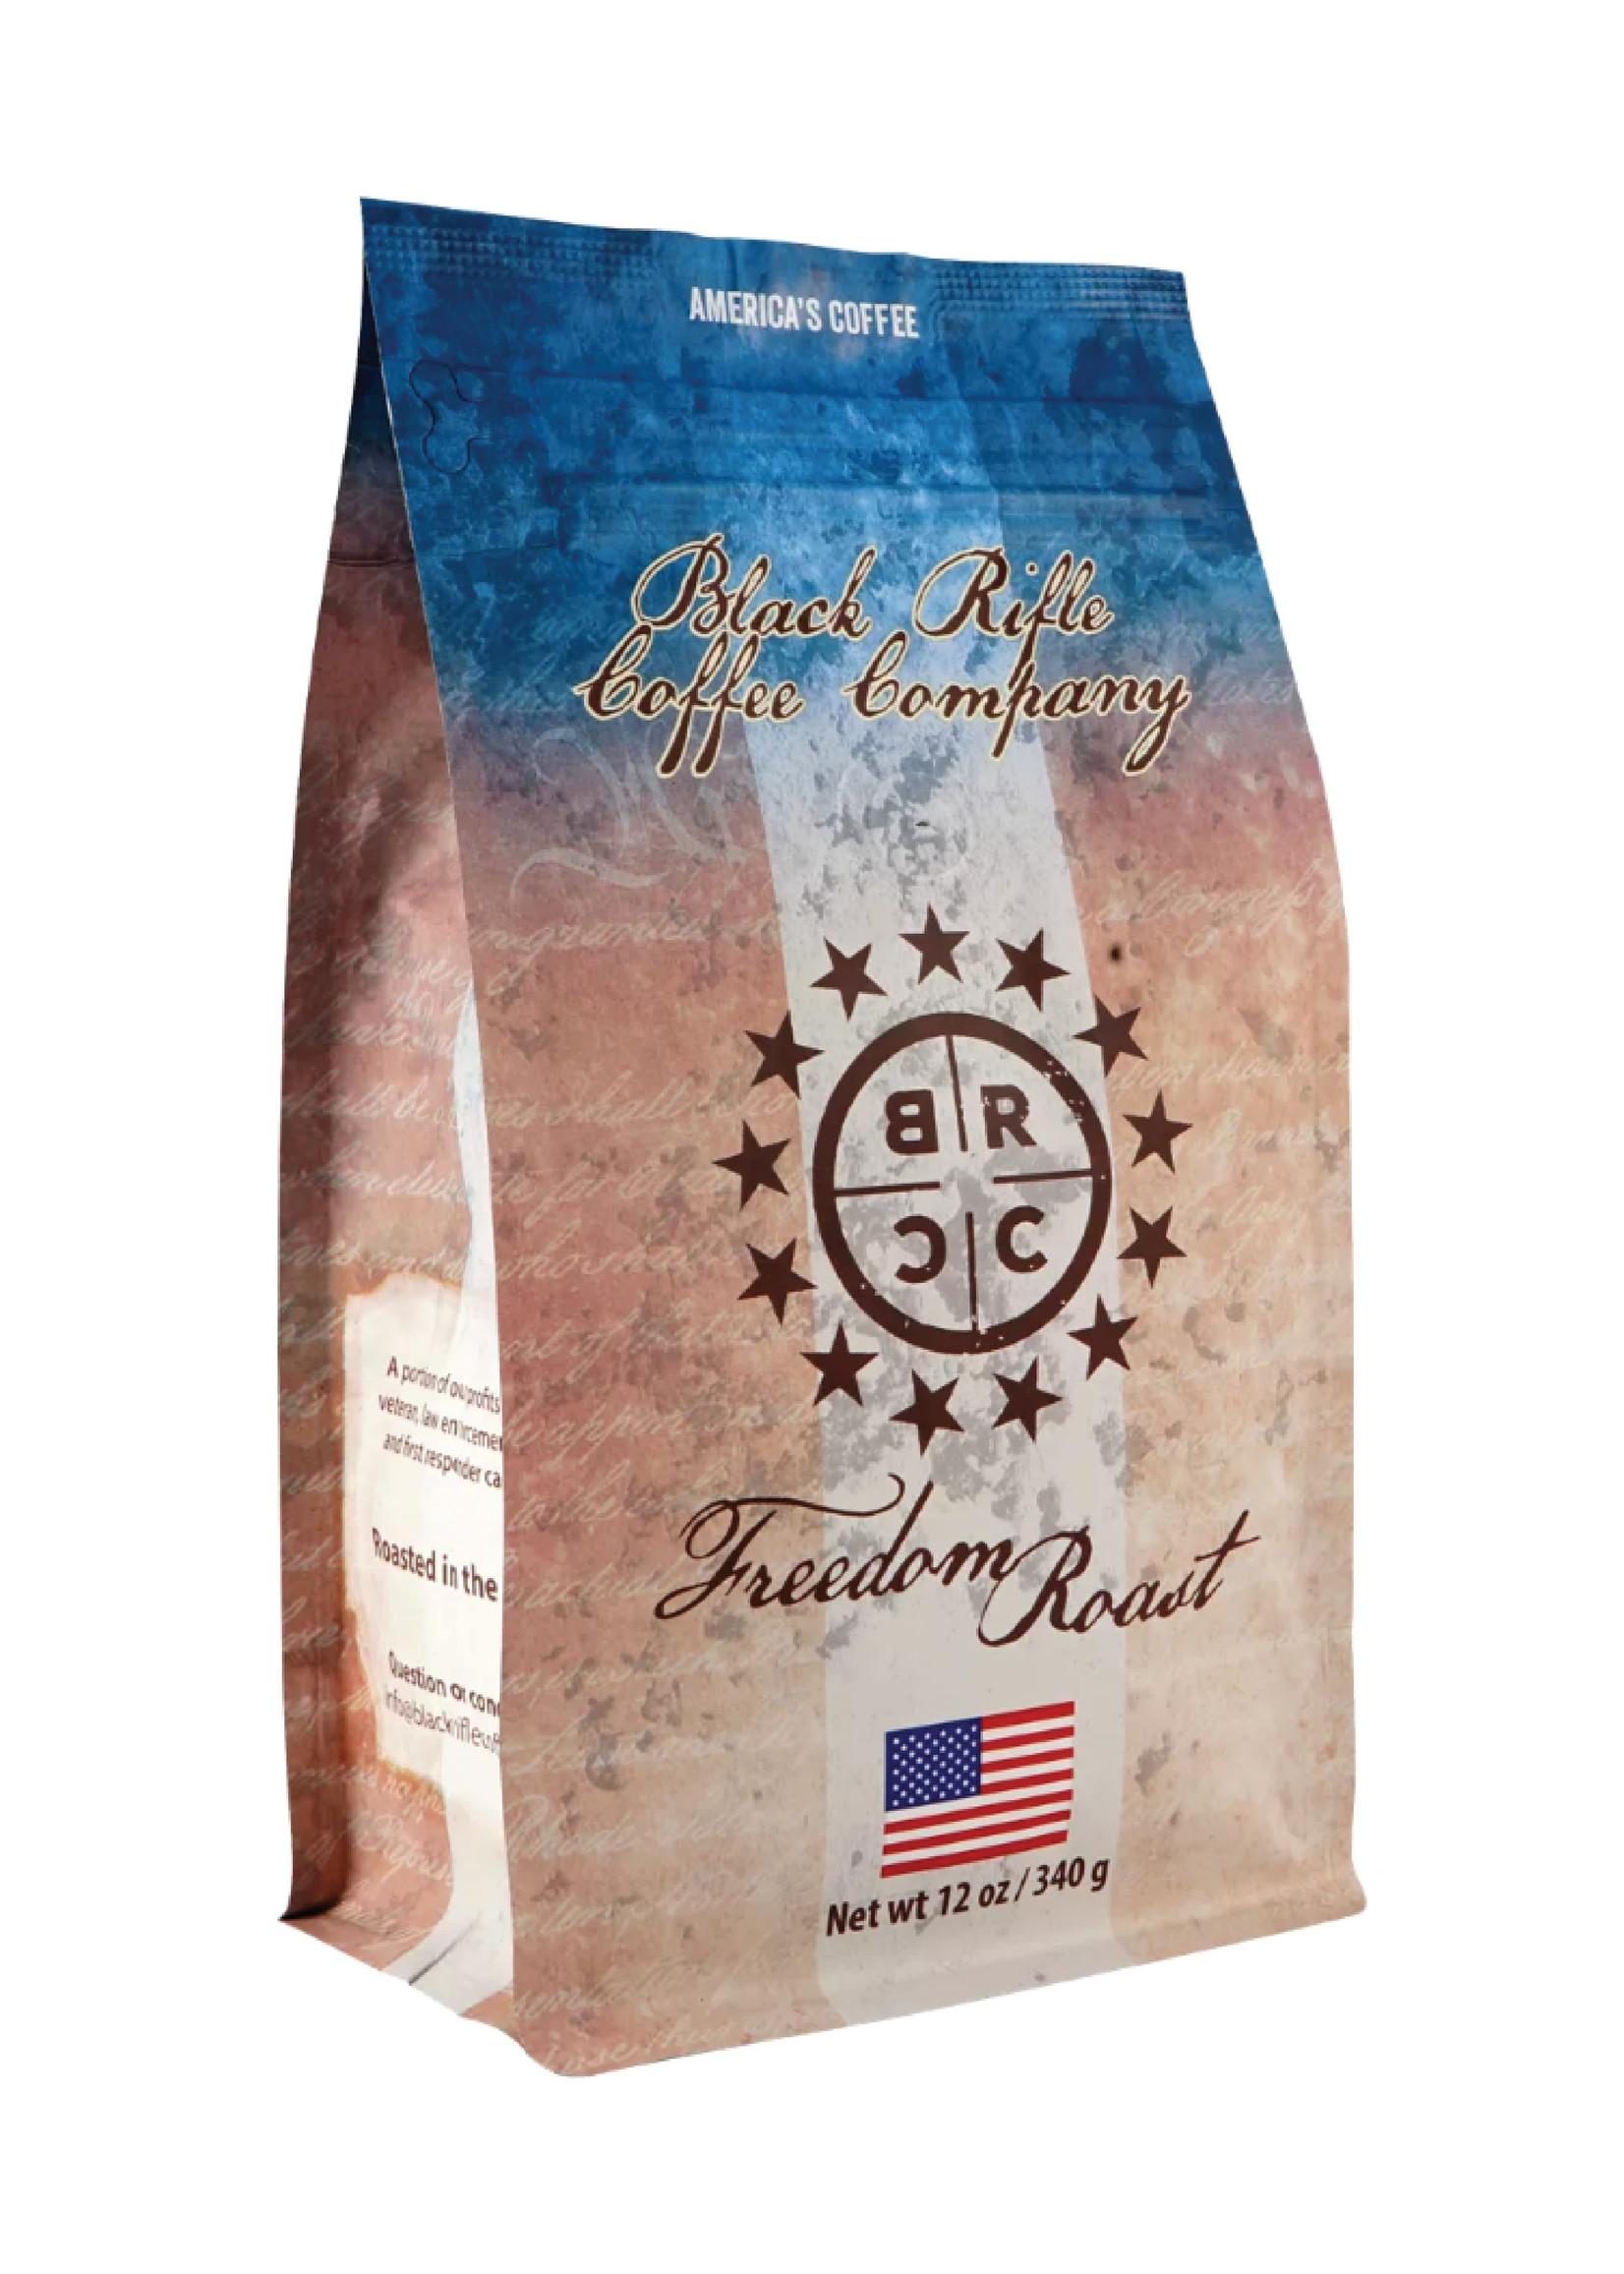 Black Rifle Coffee Company Black Rifle Coffee Company Freedom Roast Coffee Whole Bean